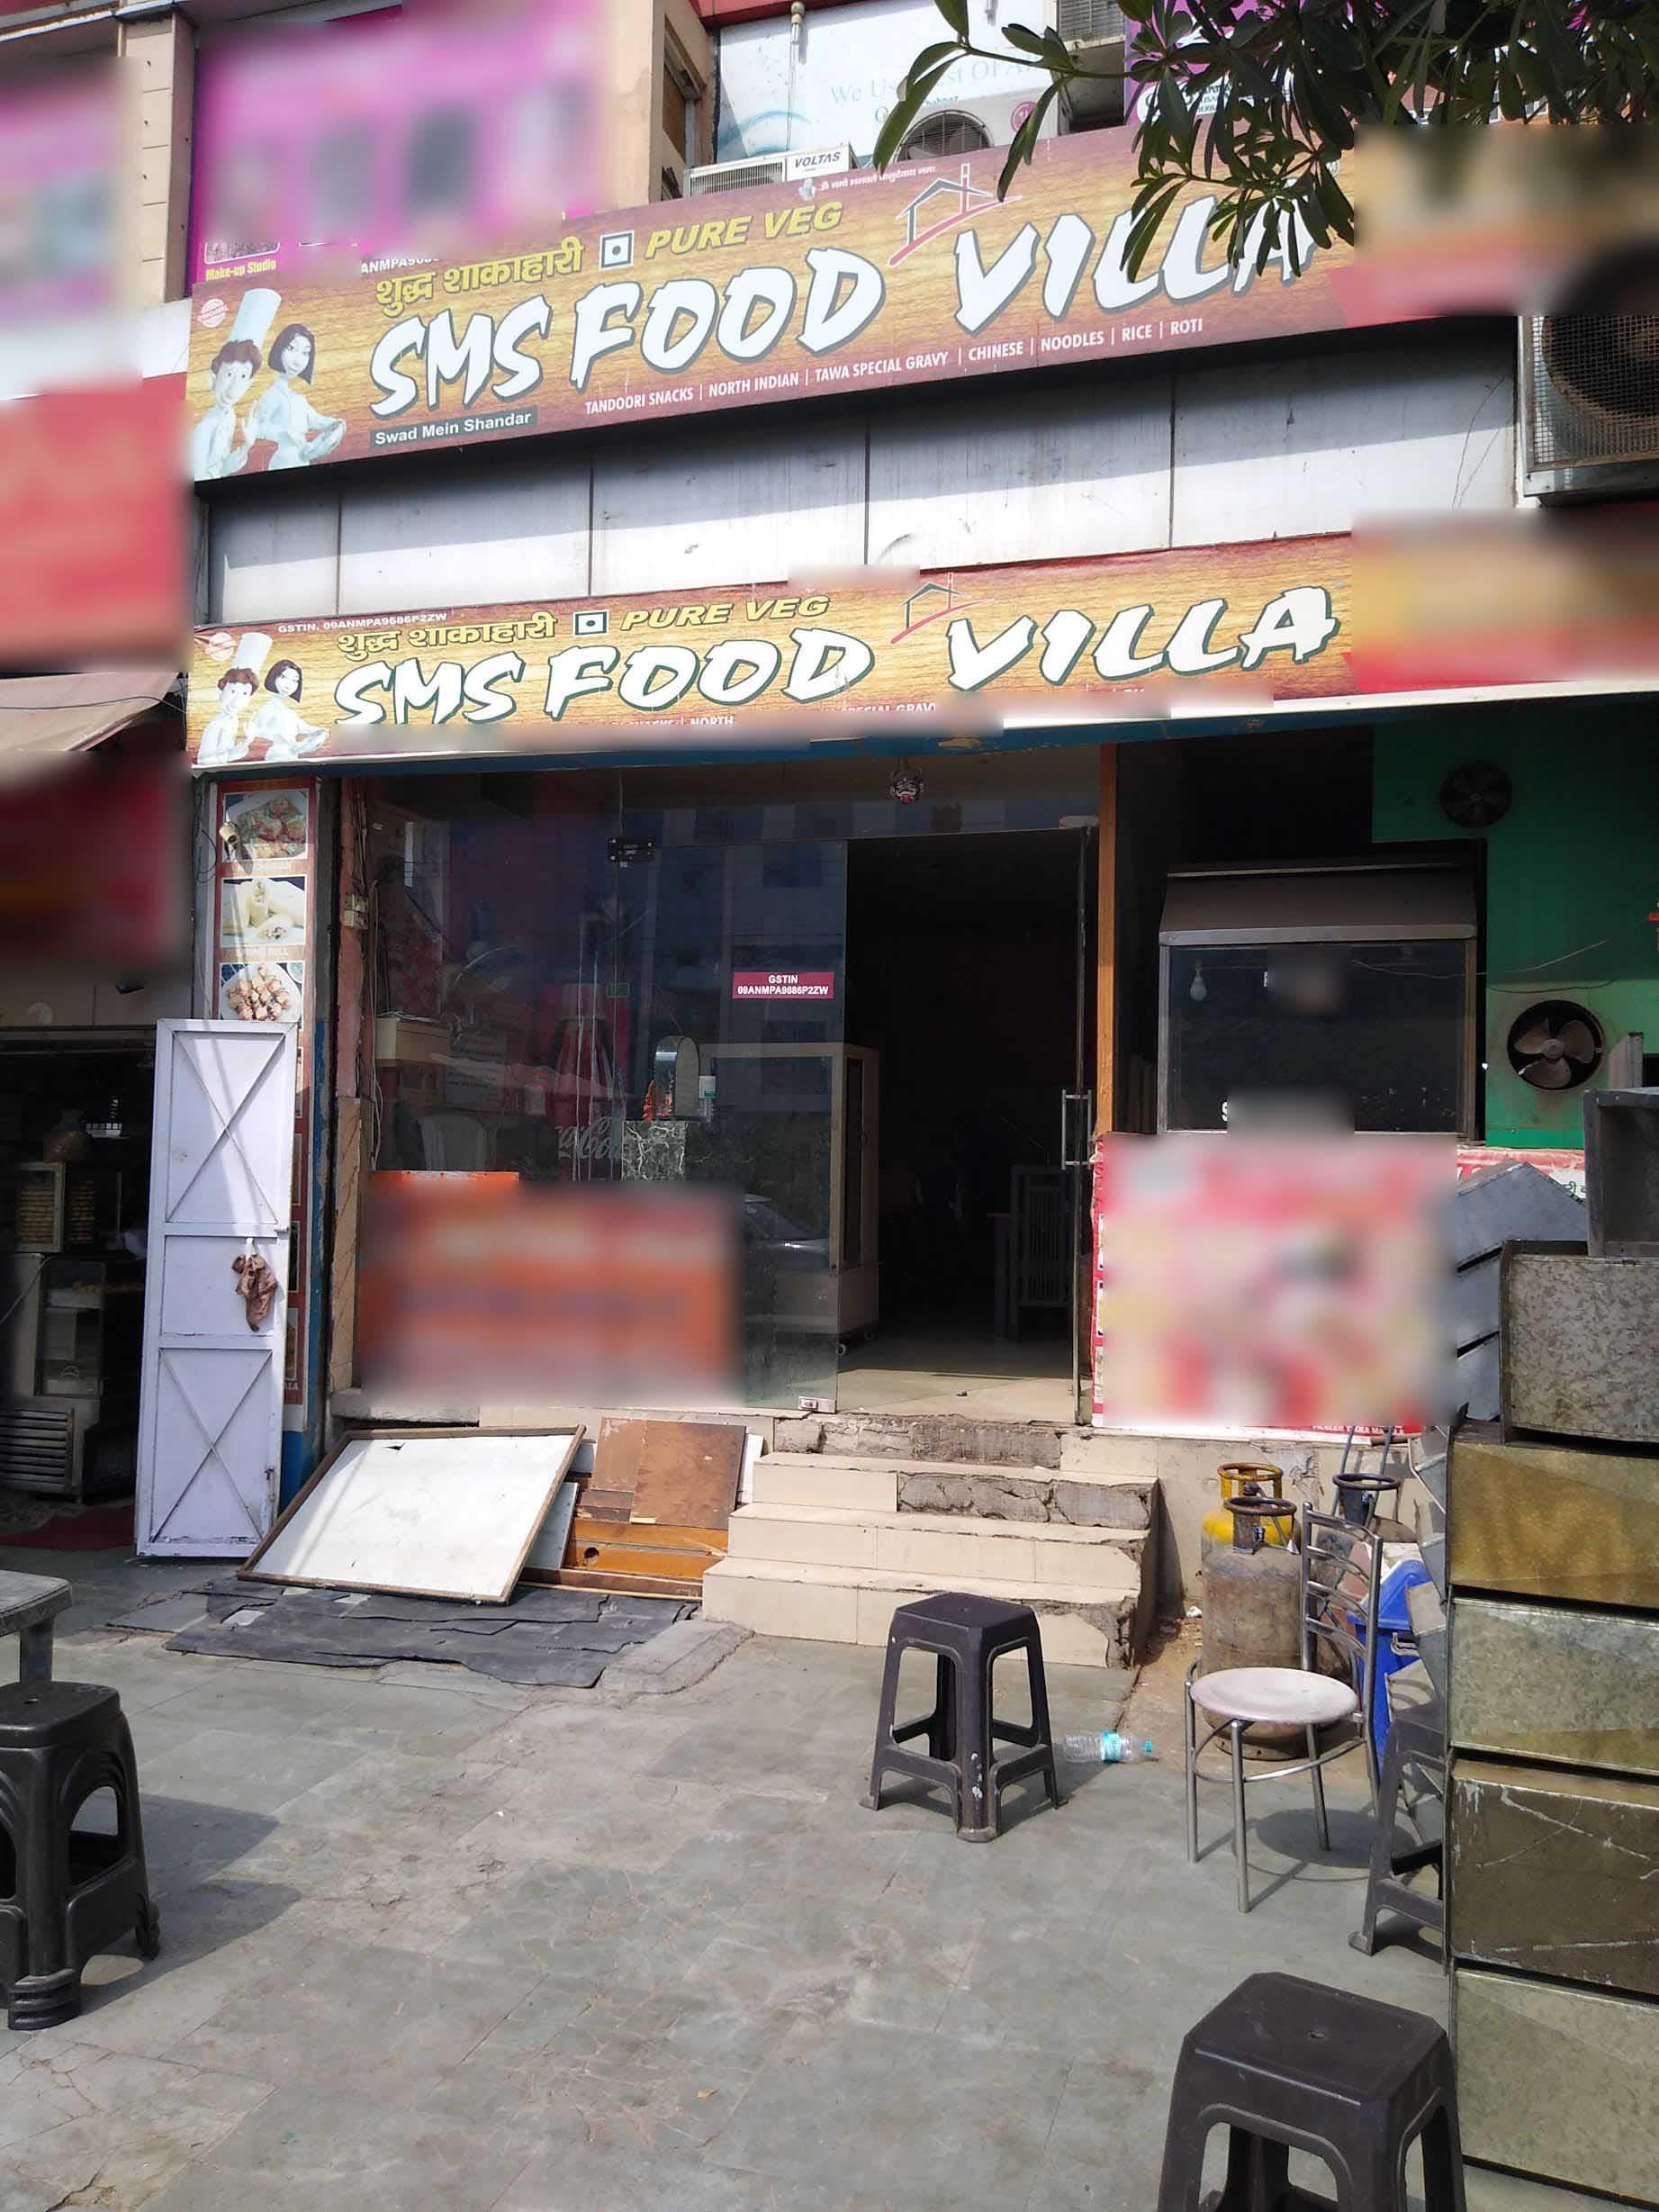 SMS Food Villa - Vasundhara - Ghaziabad Image